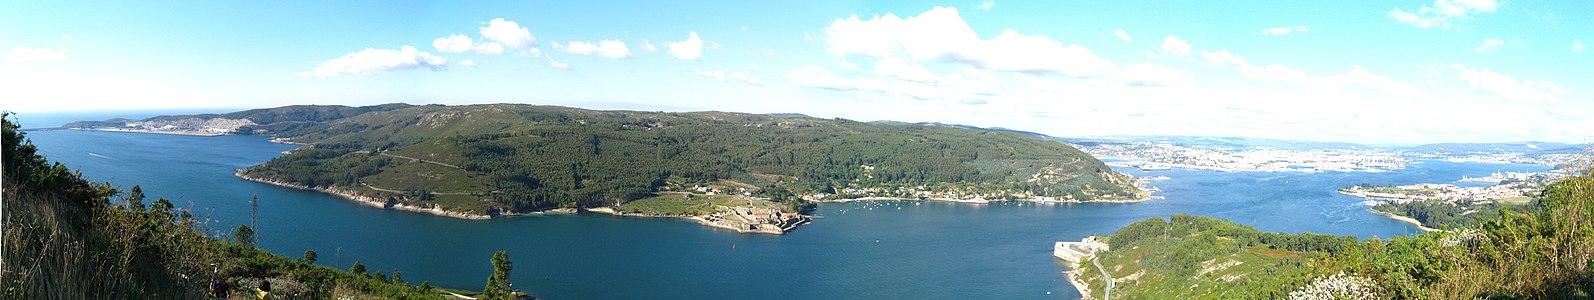 Ria de Ferrol - Galicia - Spain - 02 - Panorama.jpg